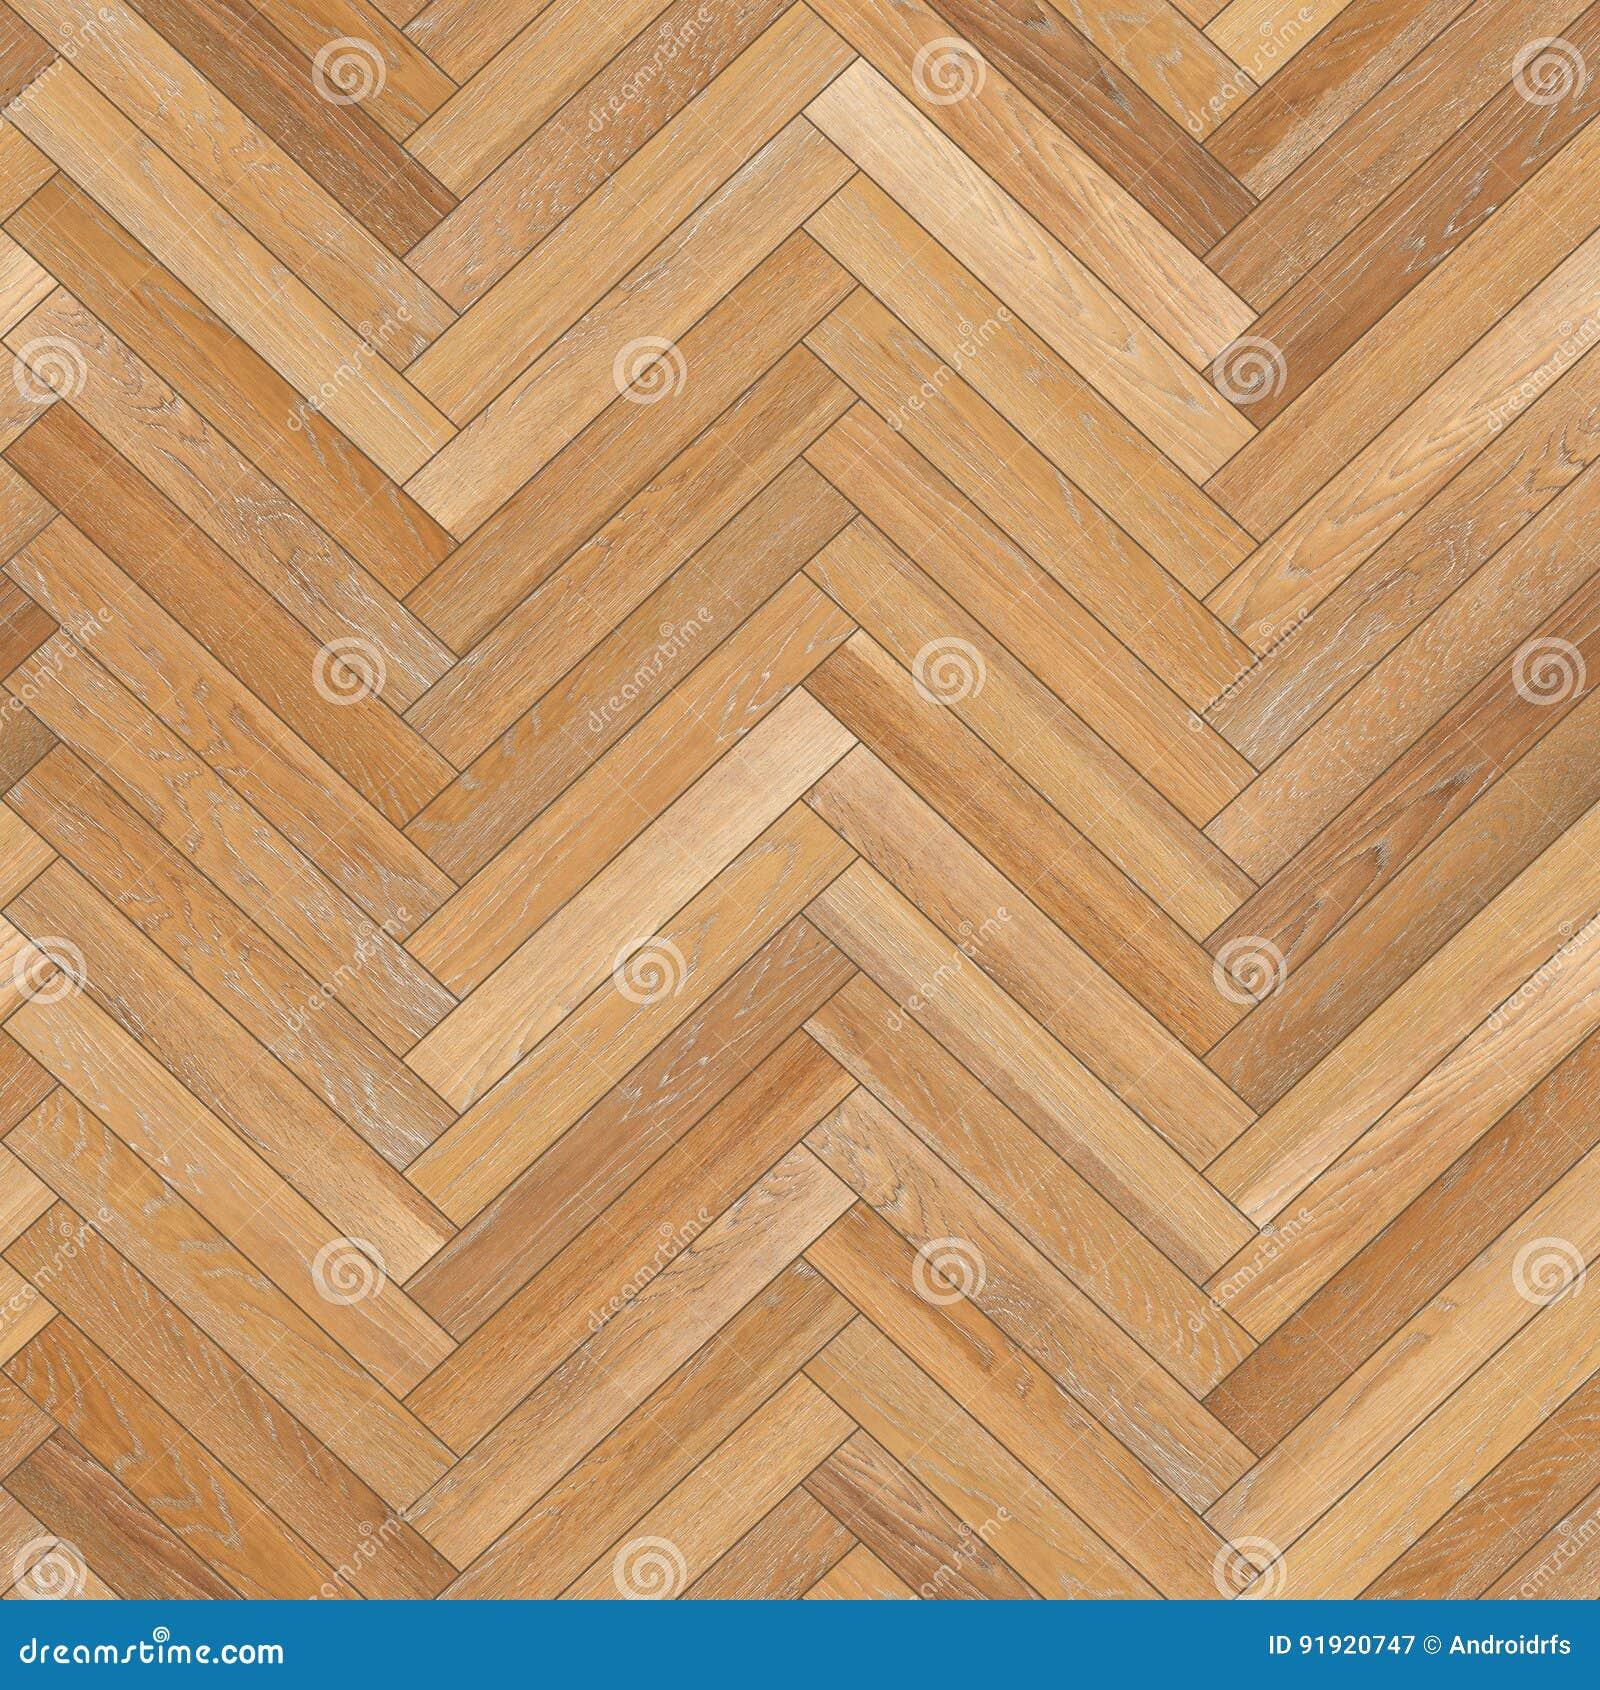 Seamless Wood Parquet Texture Herringbone Light Brown Stock Image